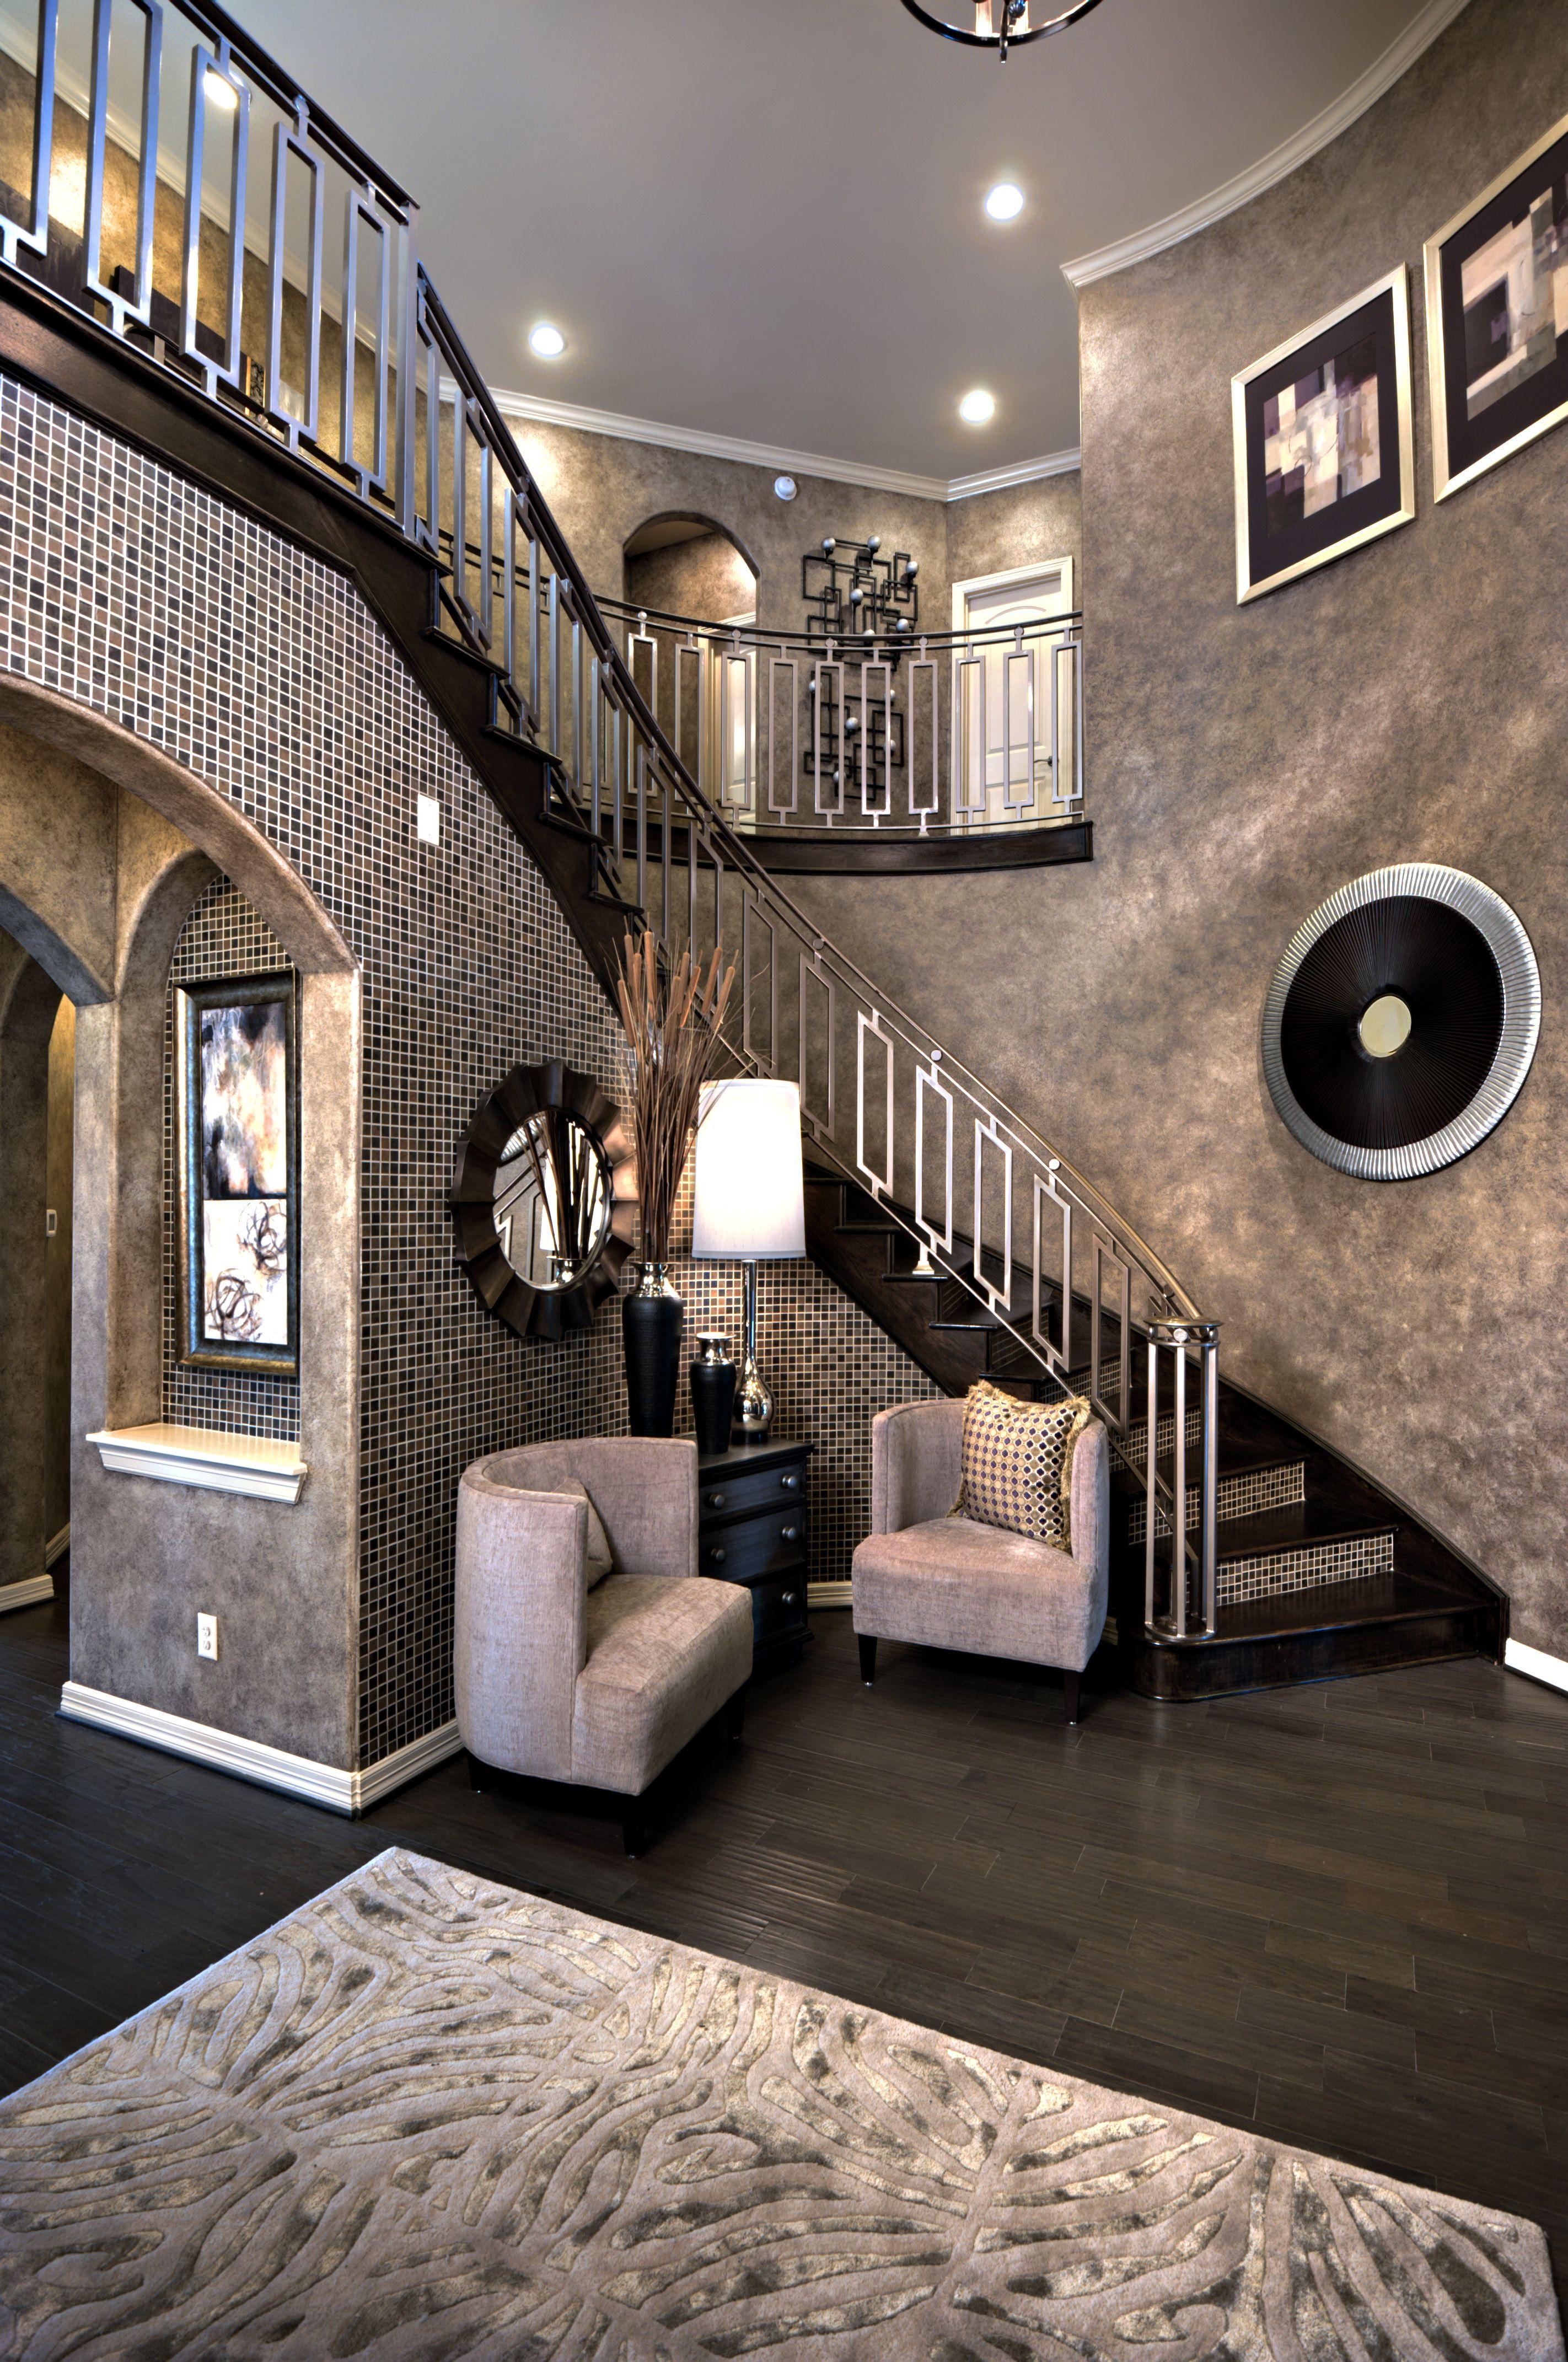 49 Most Popular Modern Dream House Exterior Design Ideas 3 In 2020: View Photos Of 28427 Tall Juniper Hill, Katy, TX 77494 - Taylor Morrison